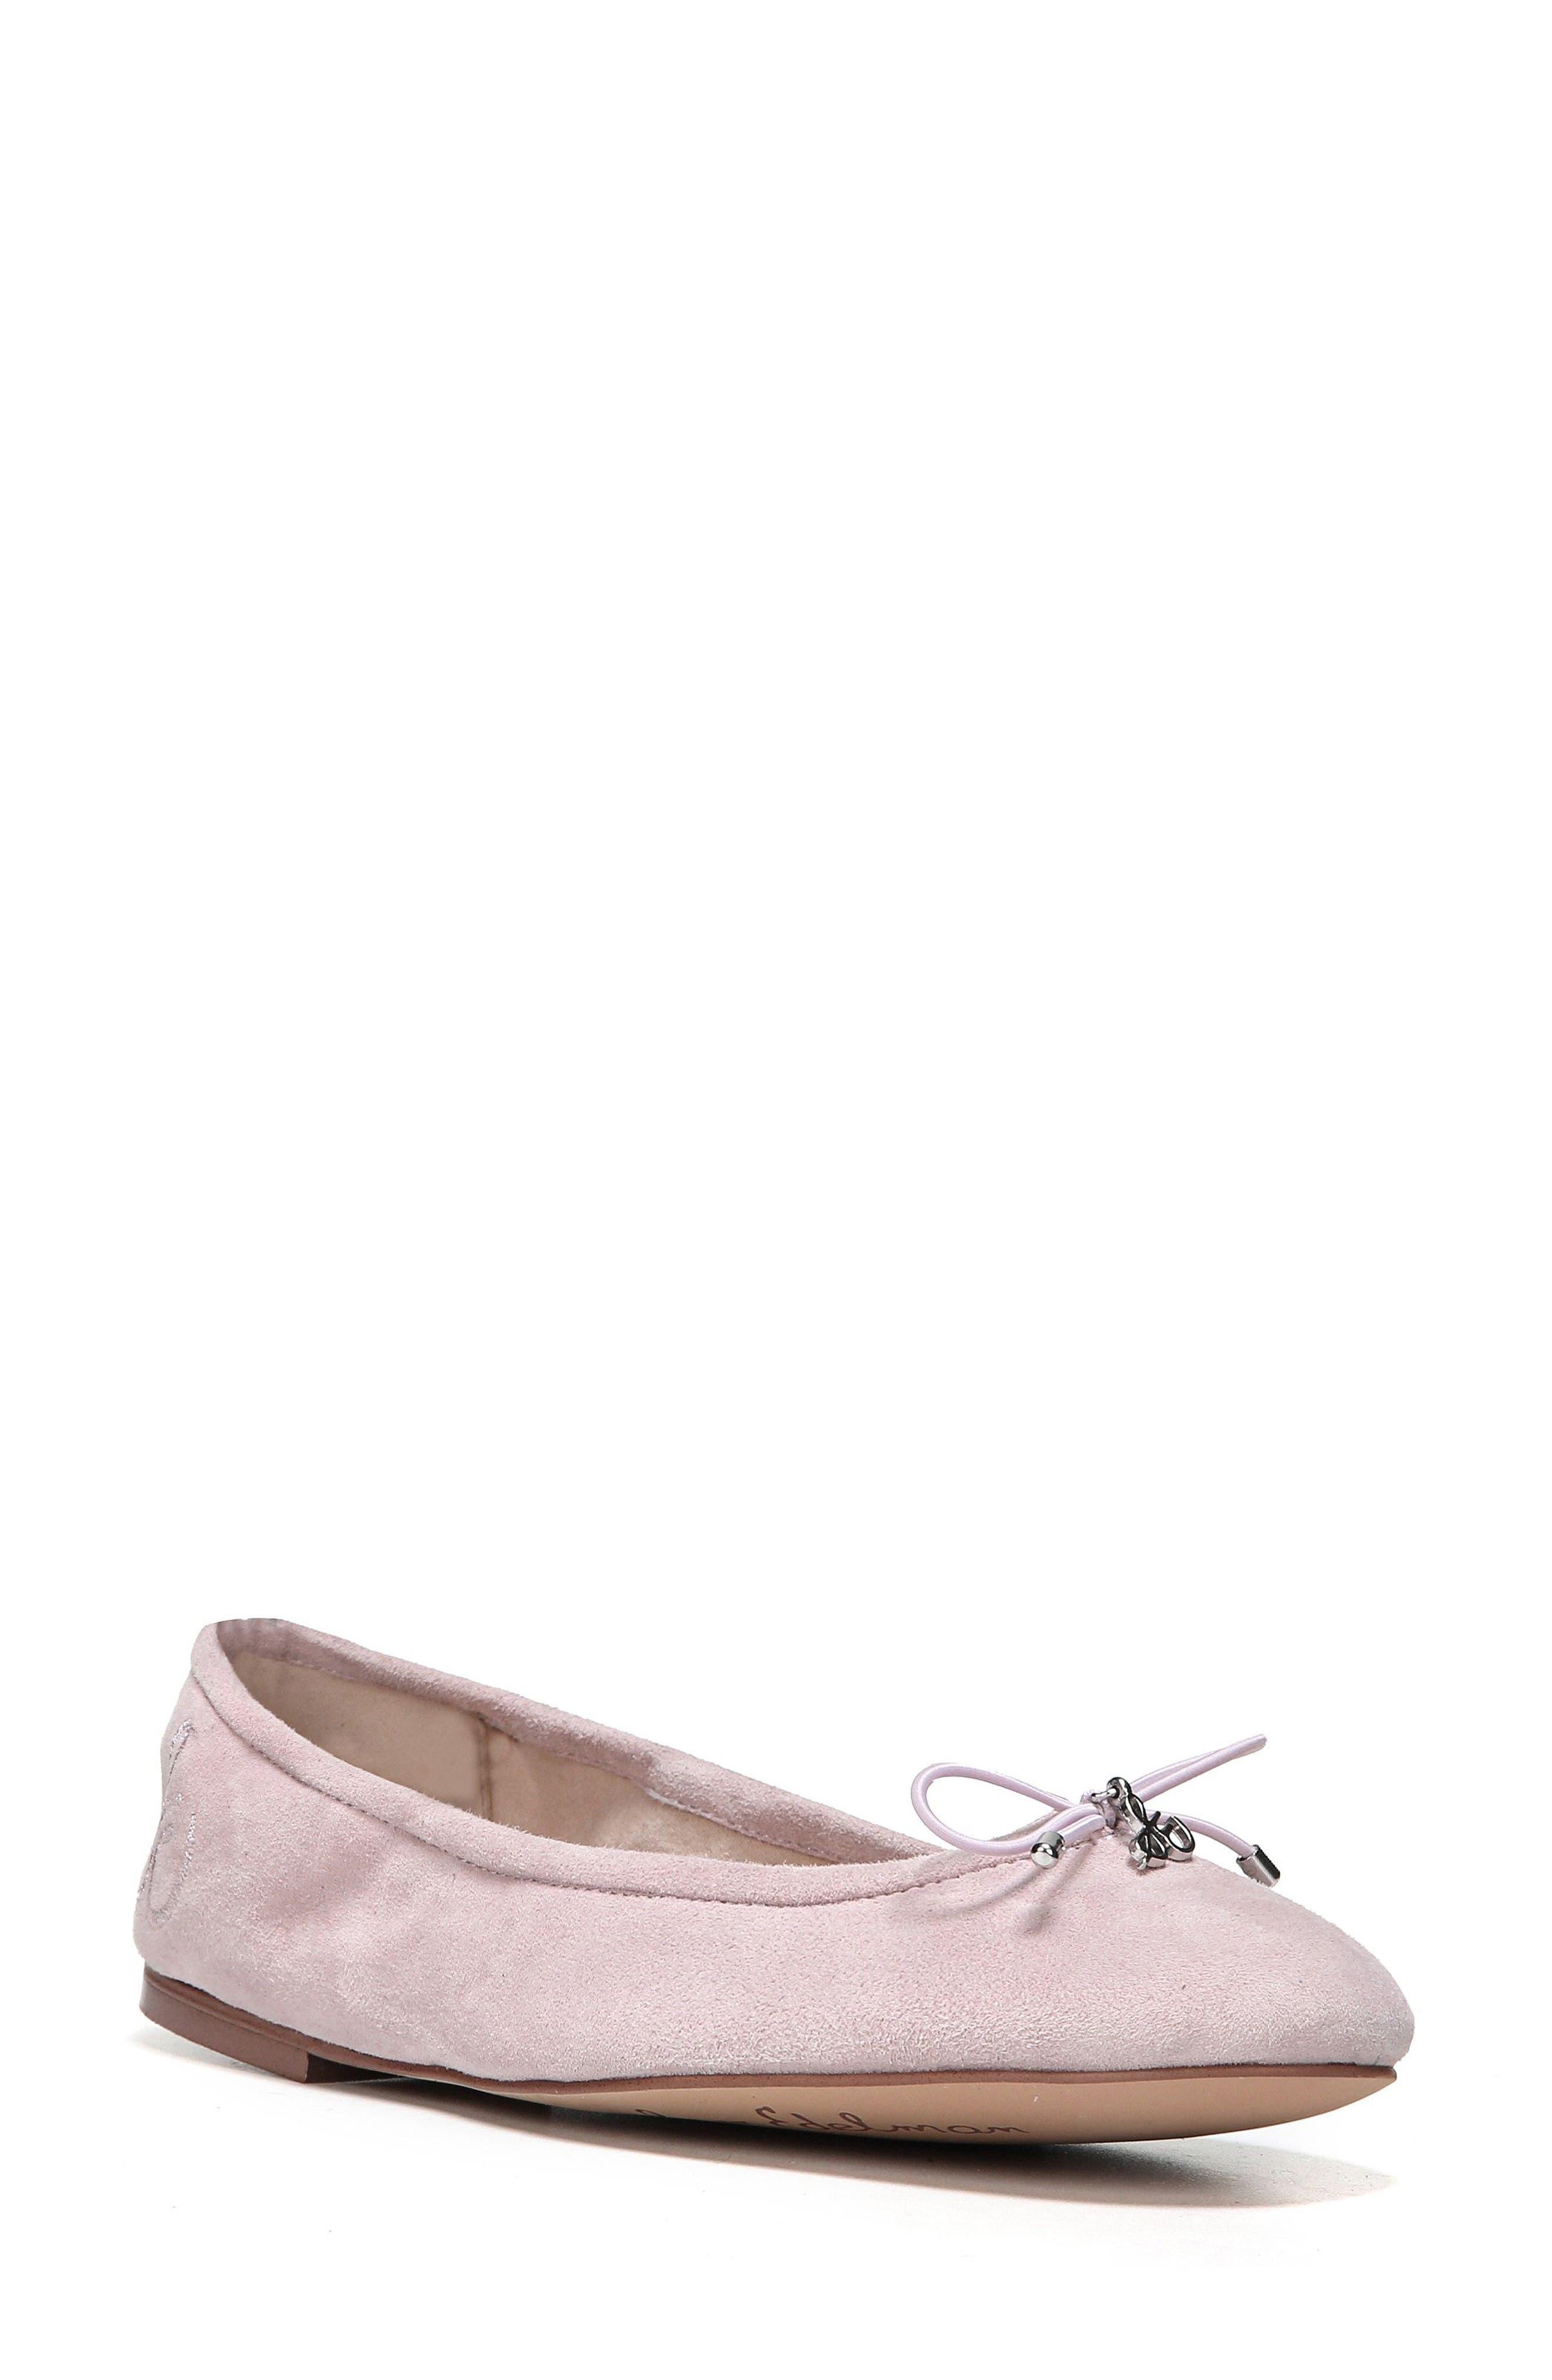 Felicia Flat,                         Main,                         color, Pearl Pink Suede